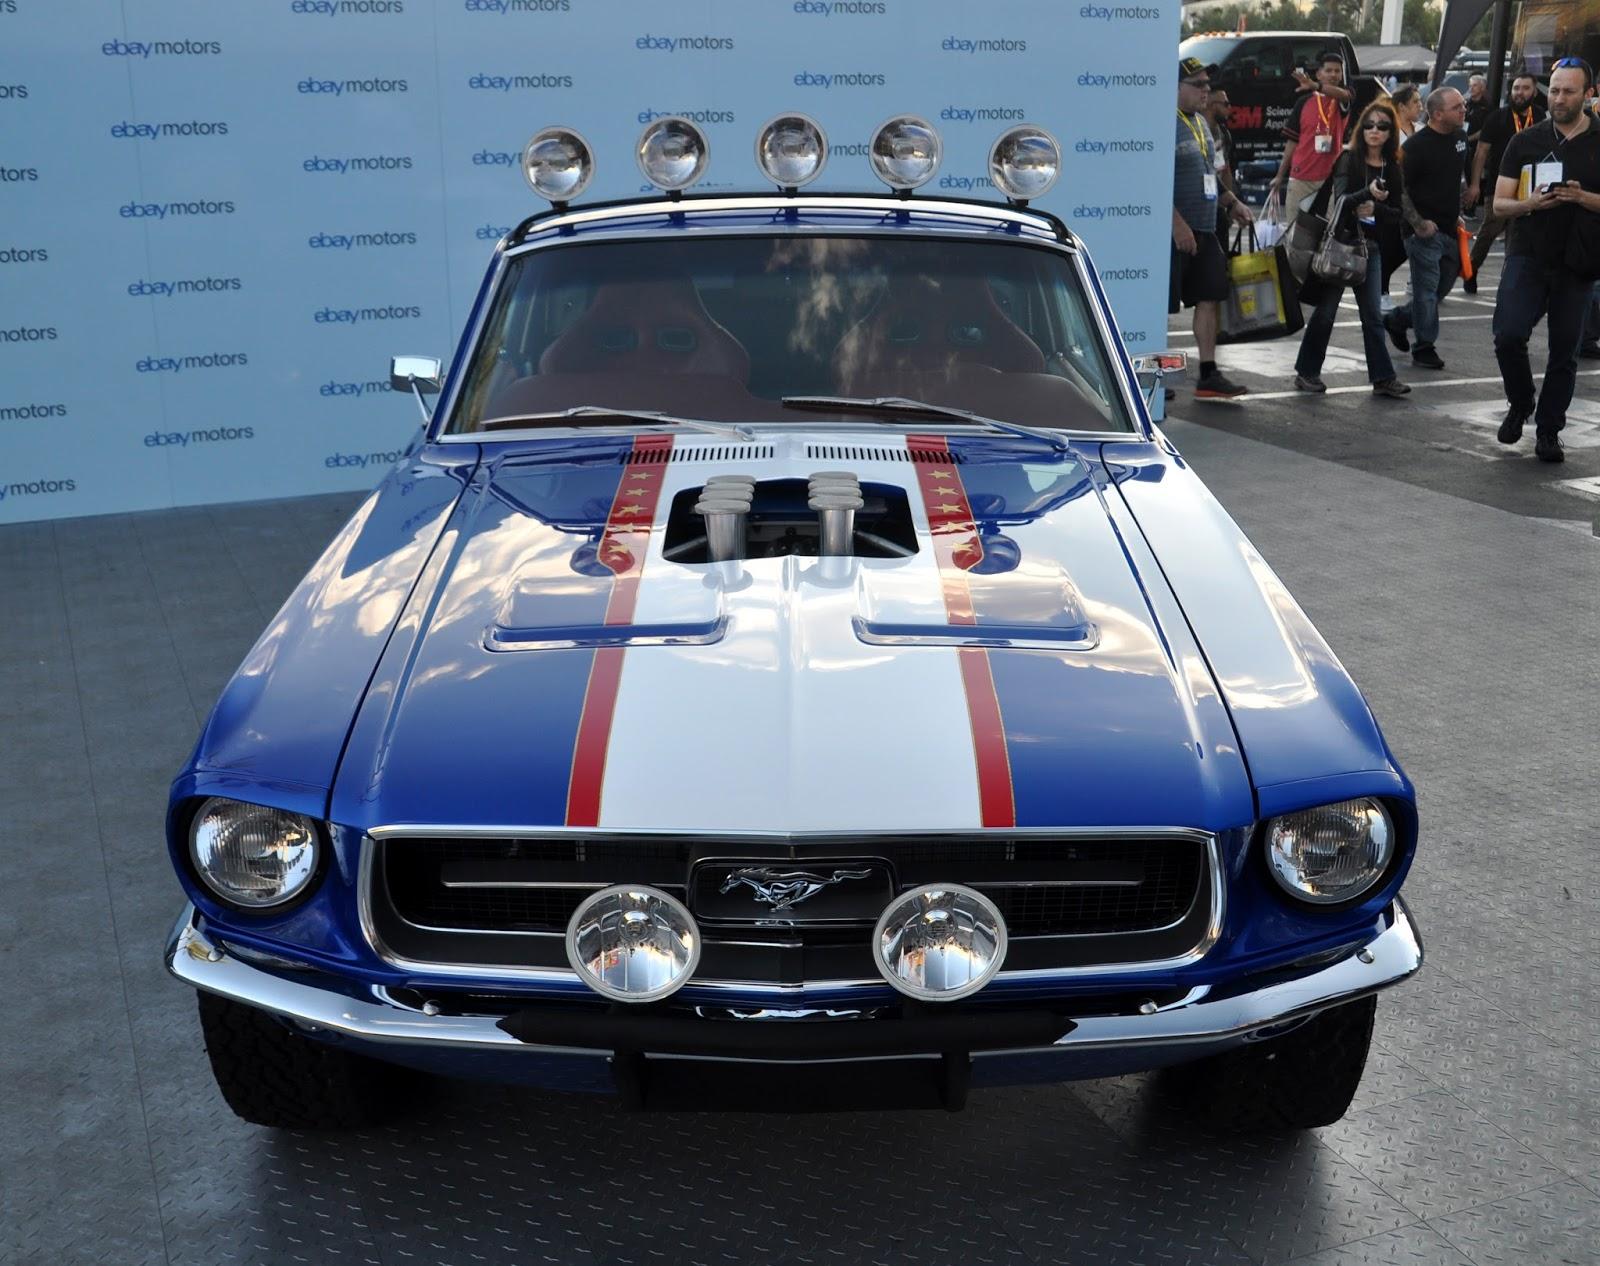 Just A Car Guy: eBay Motor\'s Rowdy \'67 Mustang Fastback